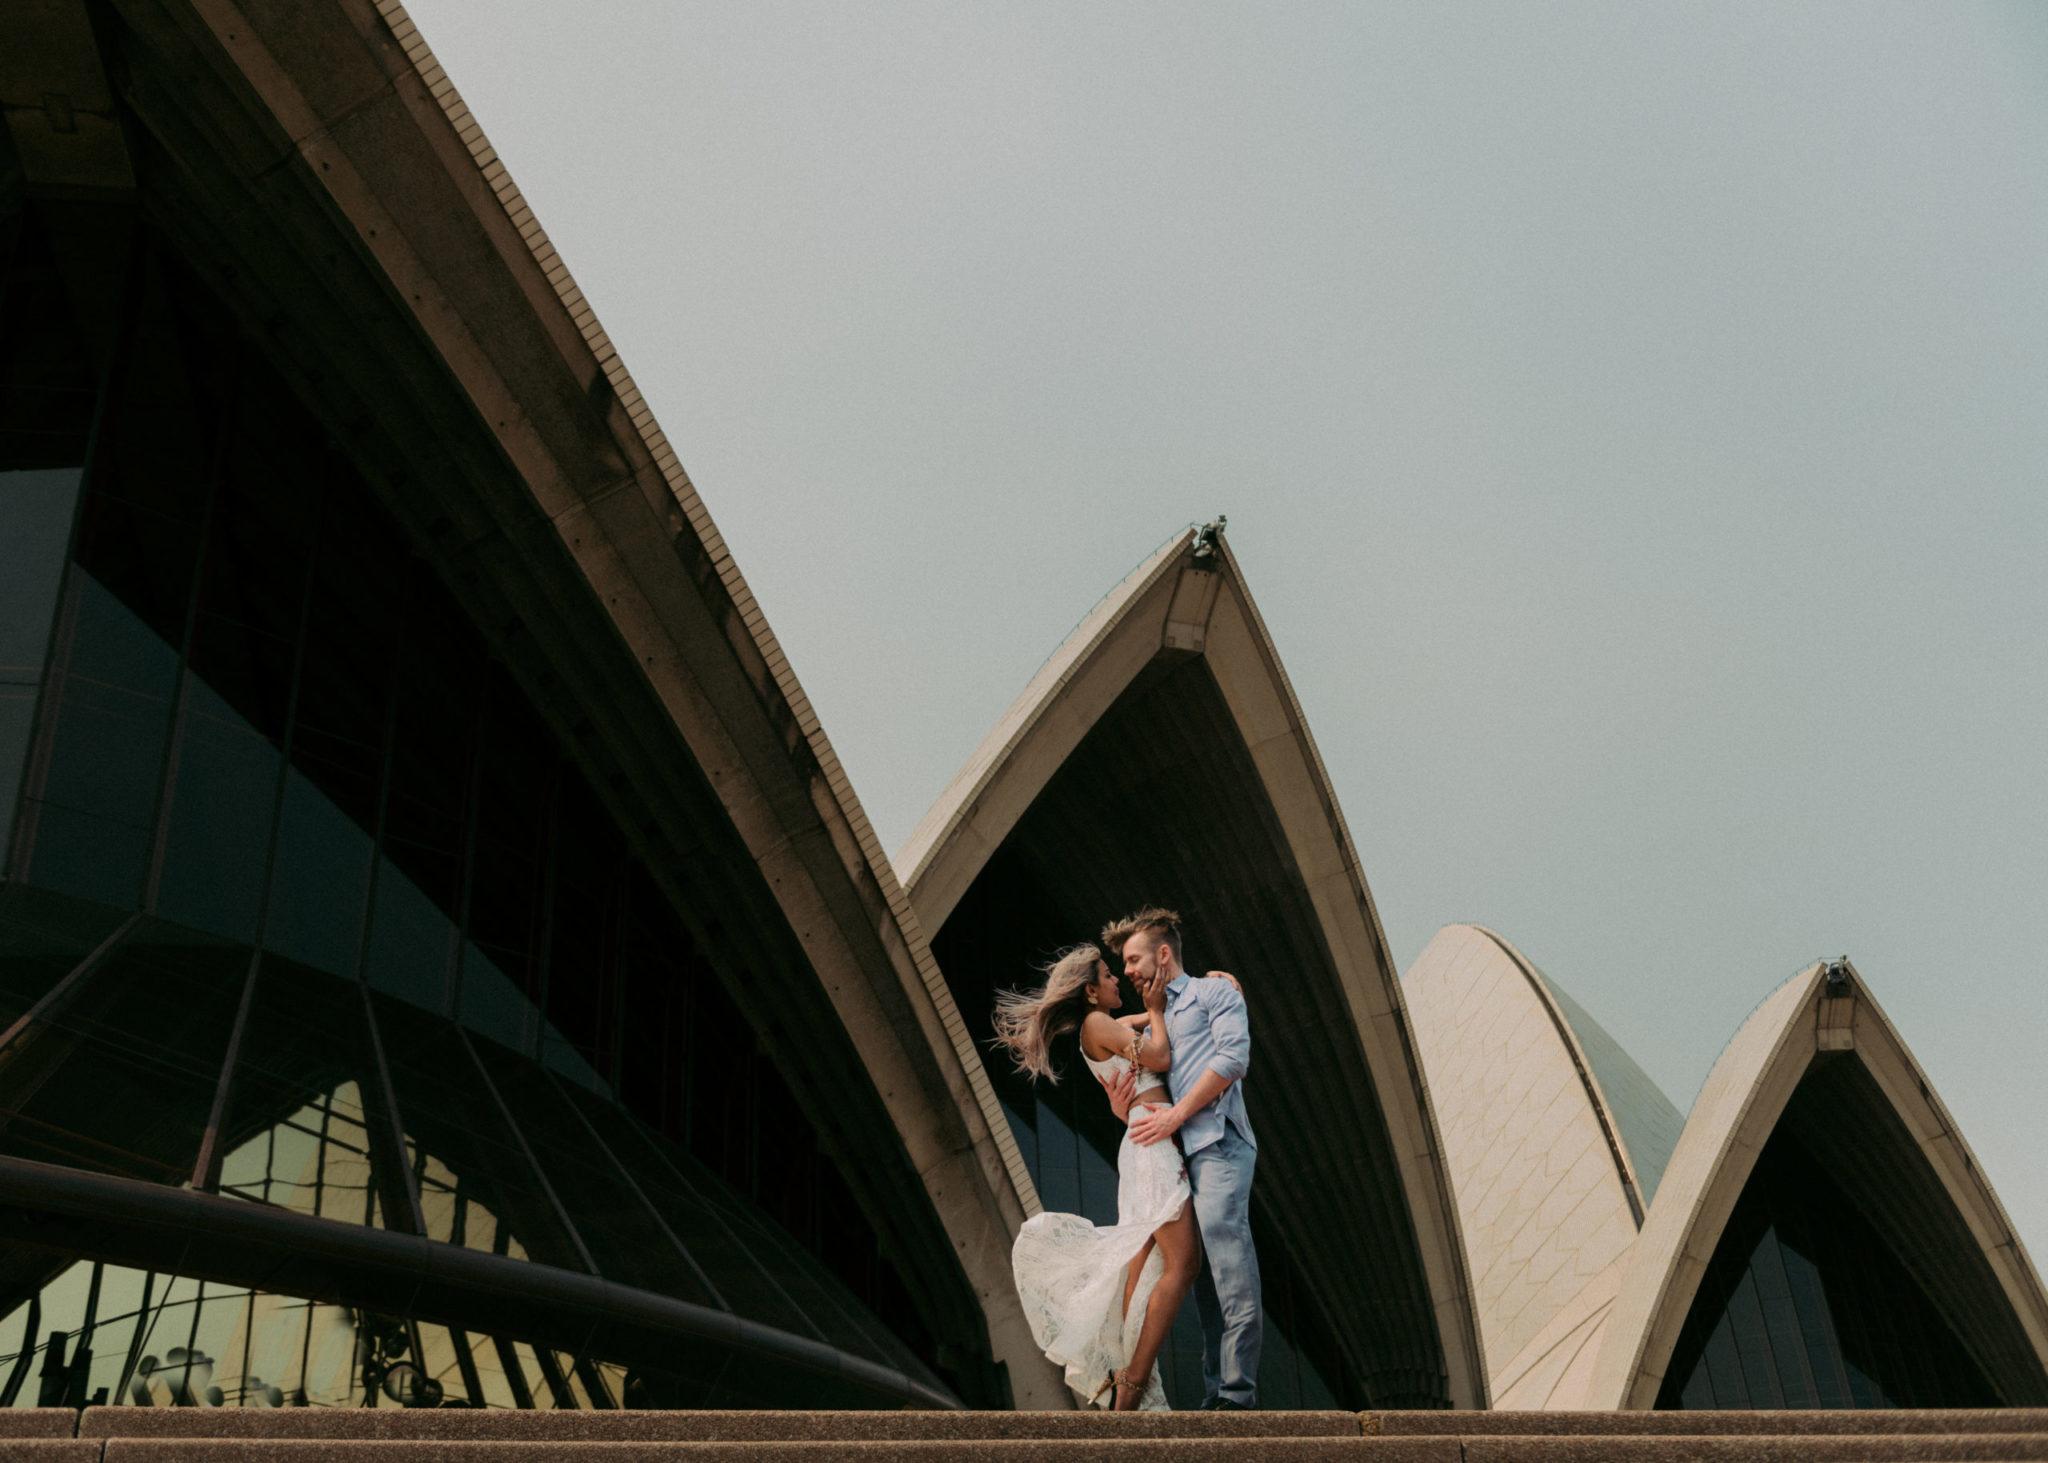 Opera House Sydney Australia Couple's Session